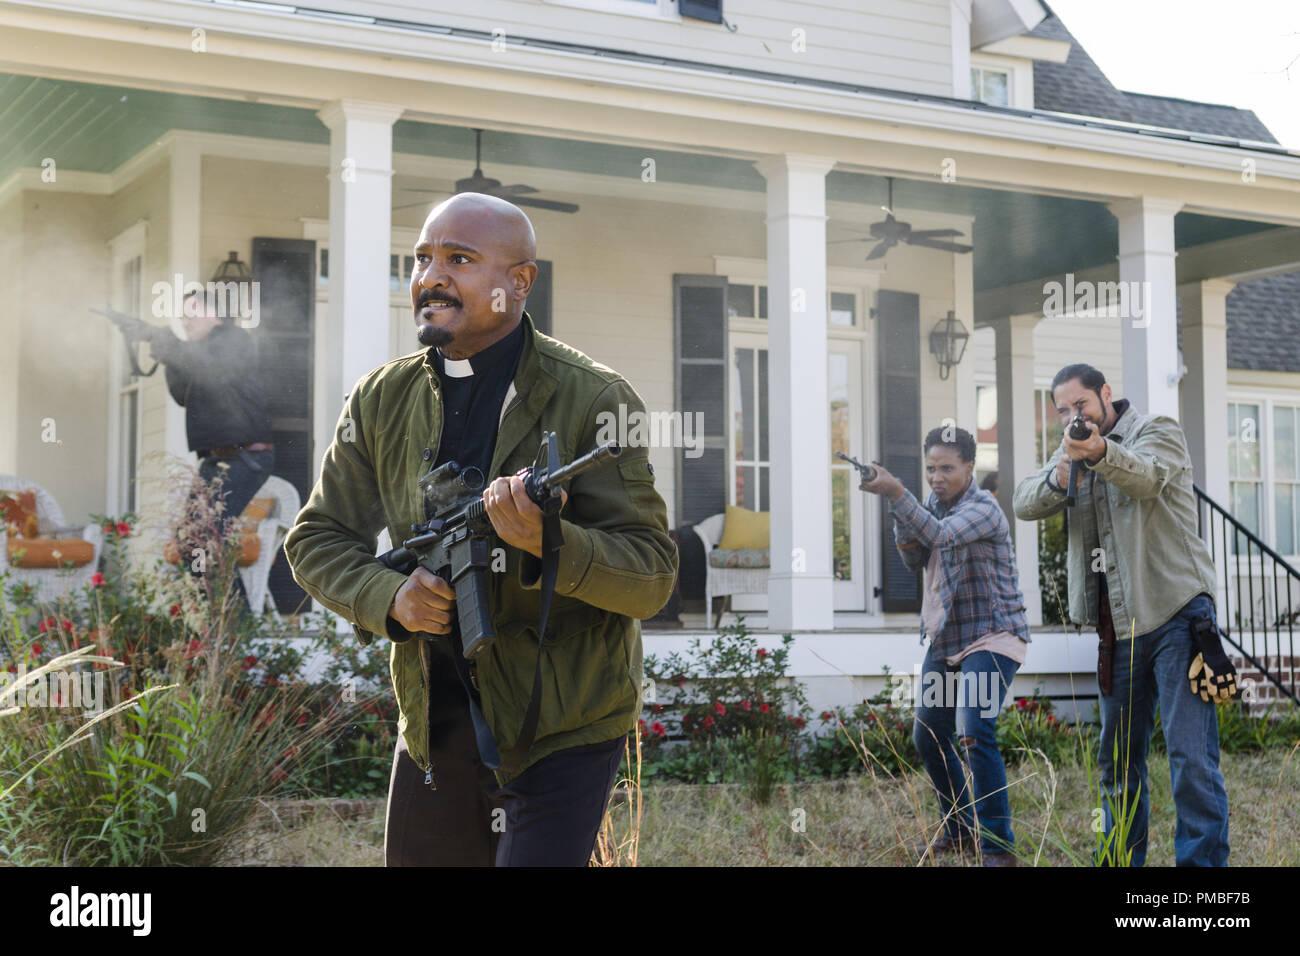 Seth Gilliam, 'The Walking Dead' Season 7 (2016-2017) AMC - Stock Image